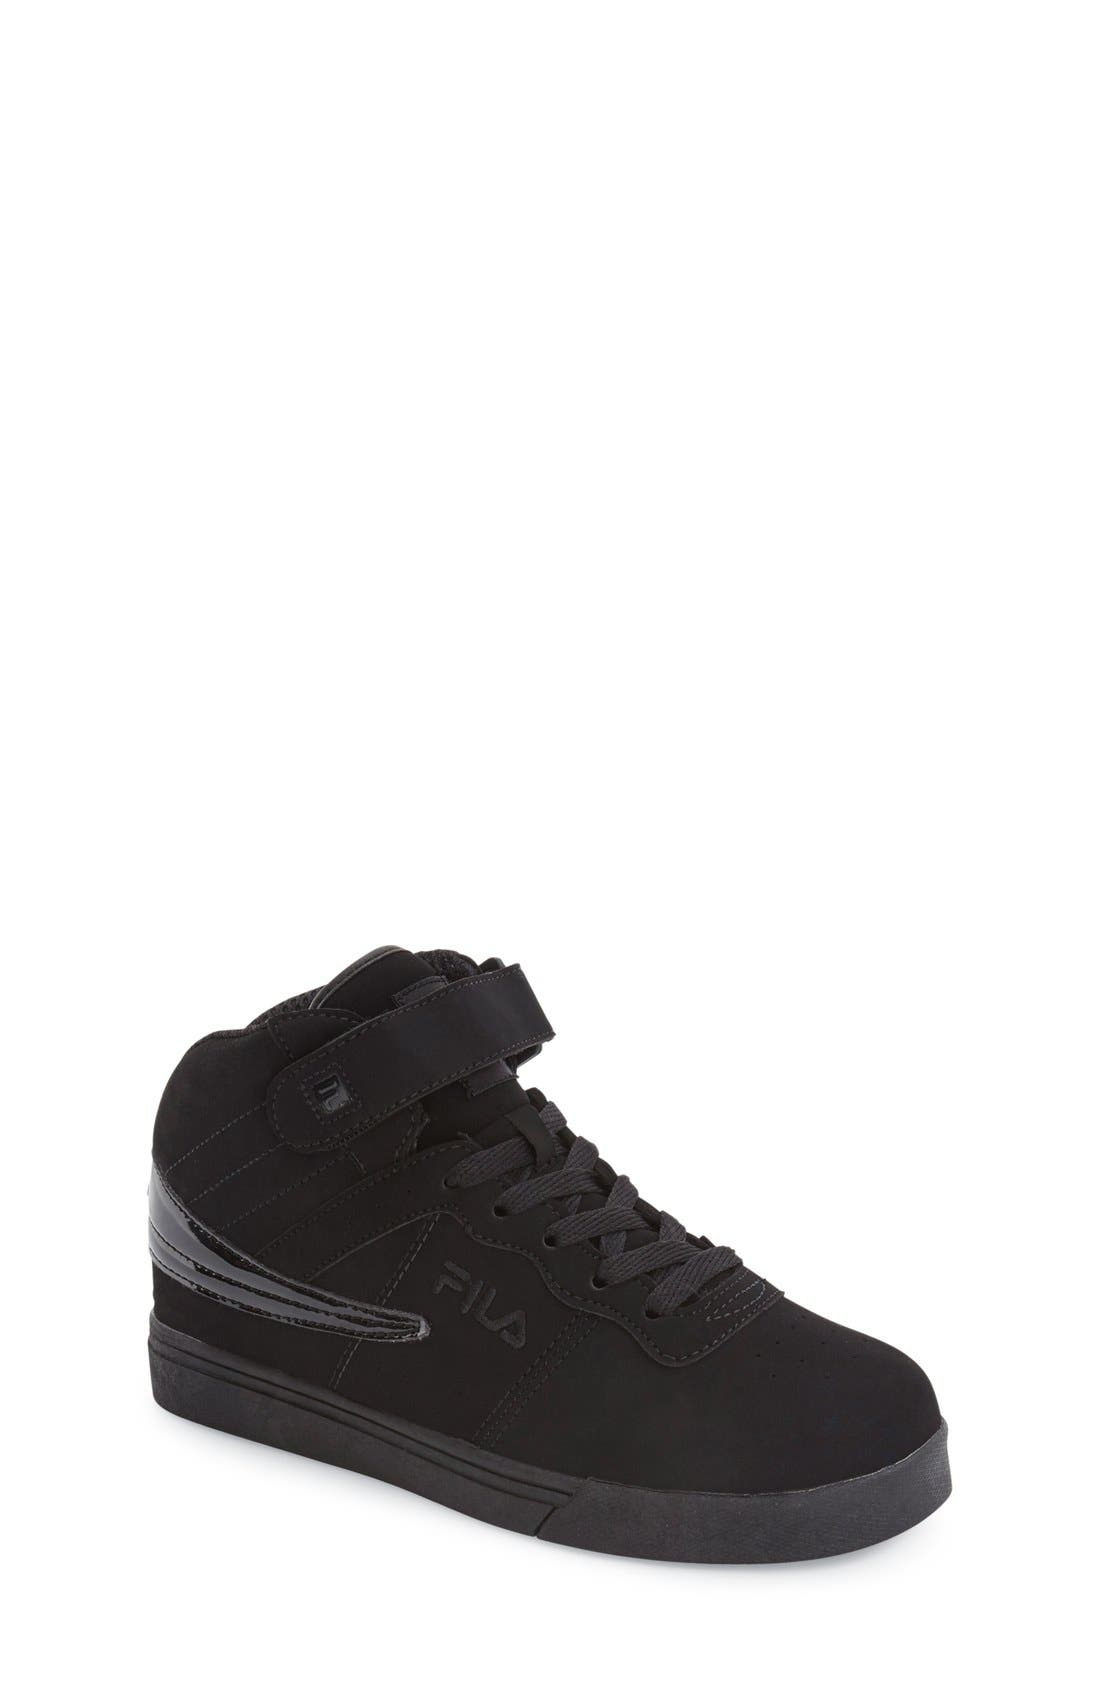 Vulc 13 High Top Sneaker,                             Main thumbnail 1, color,                             001